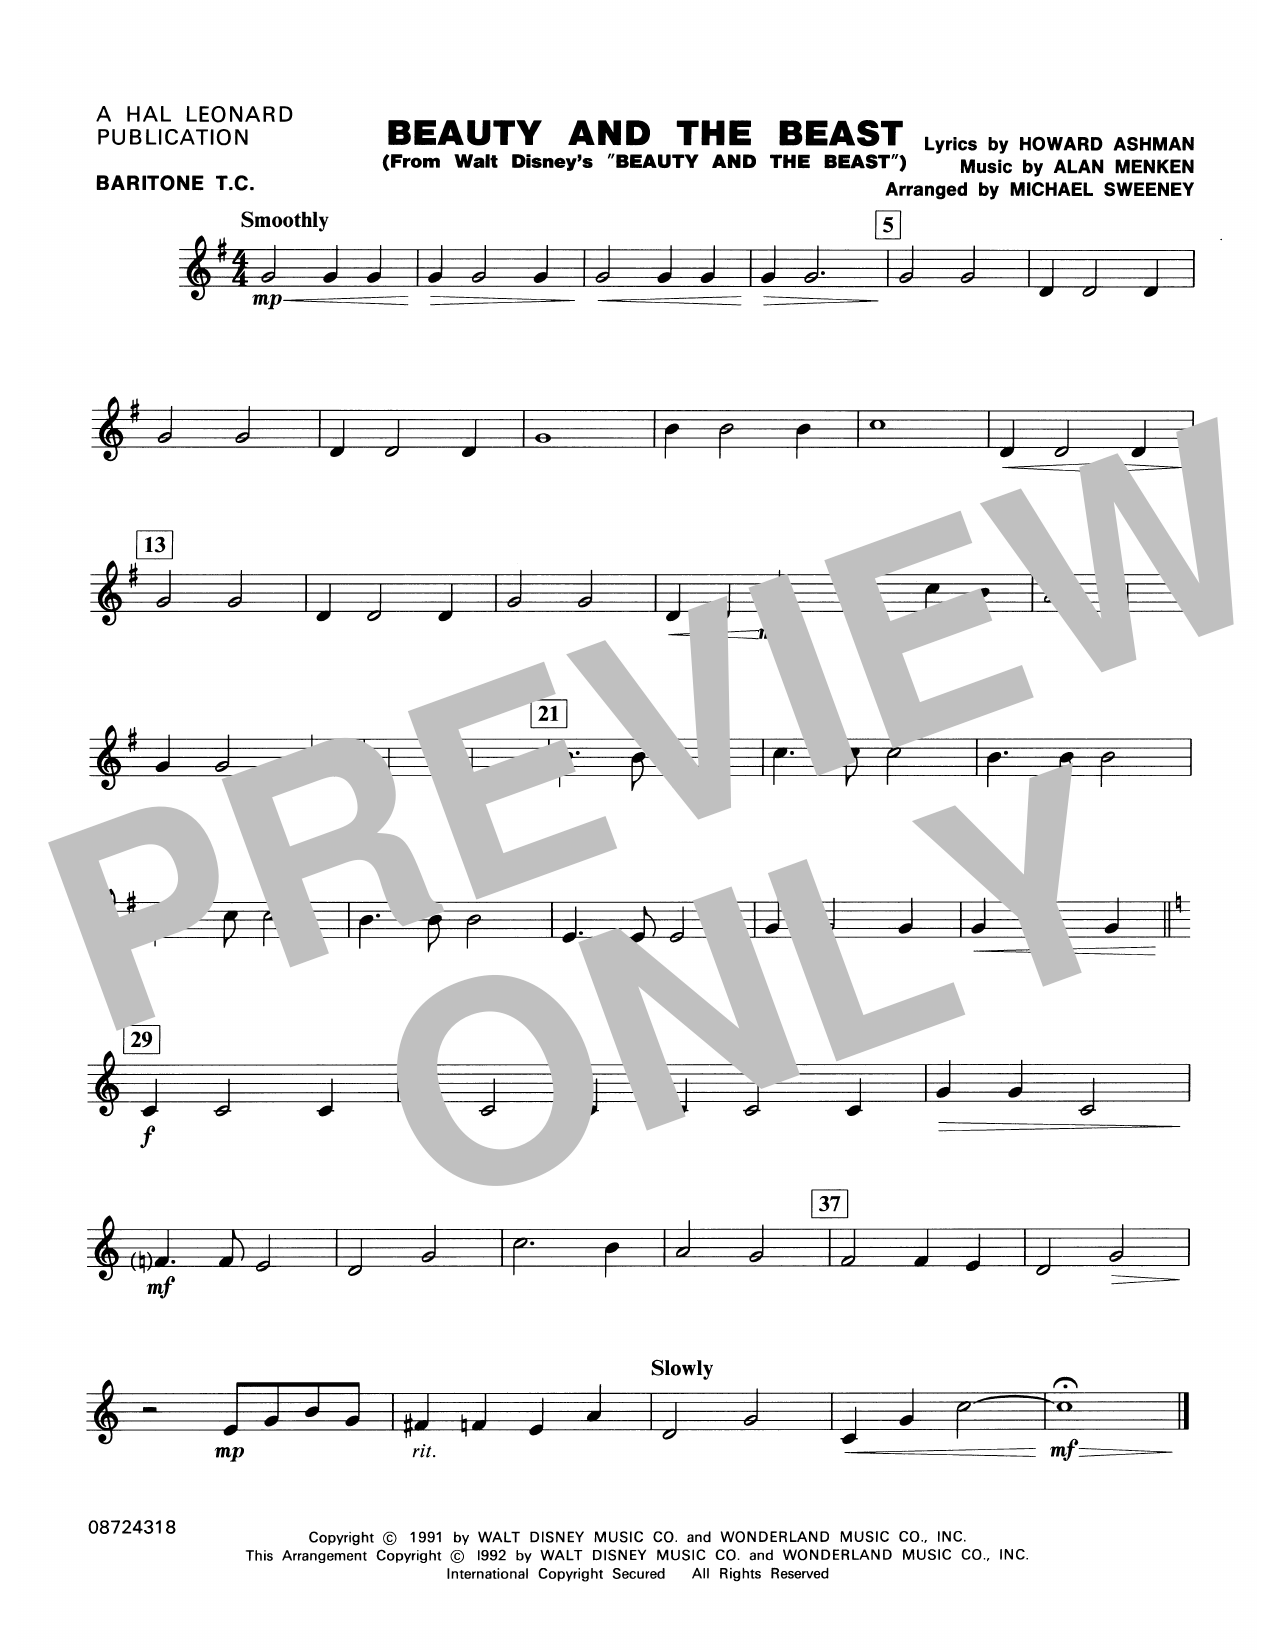 Beauty and the Beast - Baritone T.C. Sheet Music